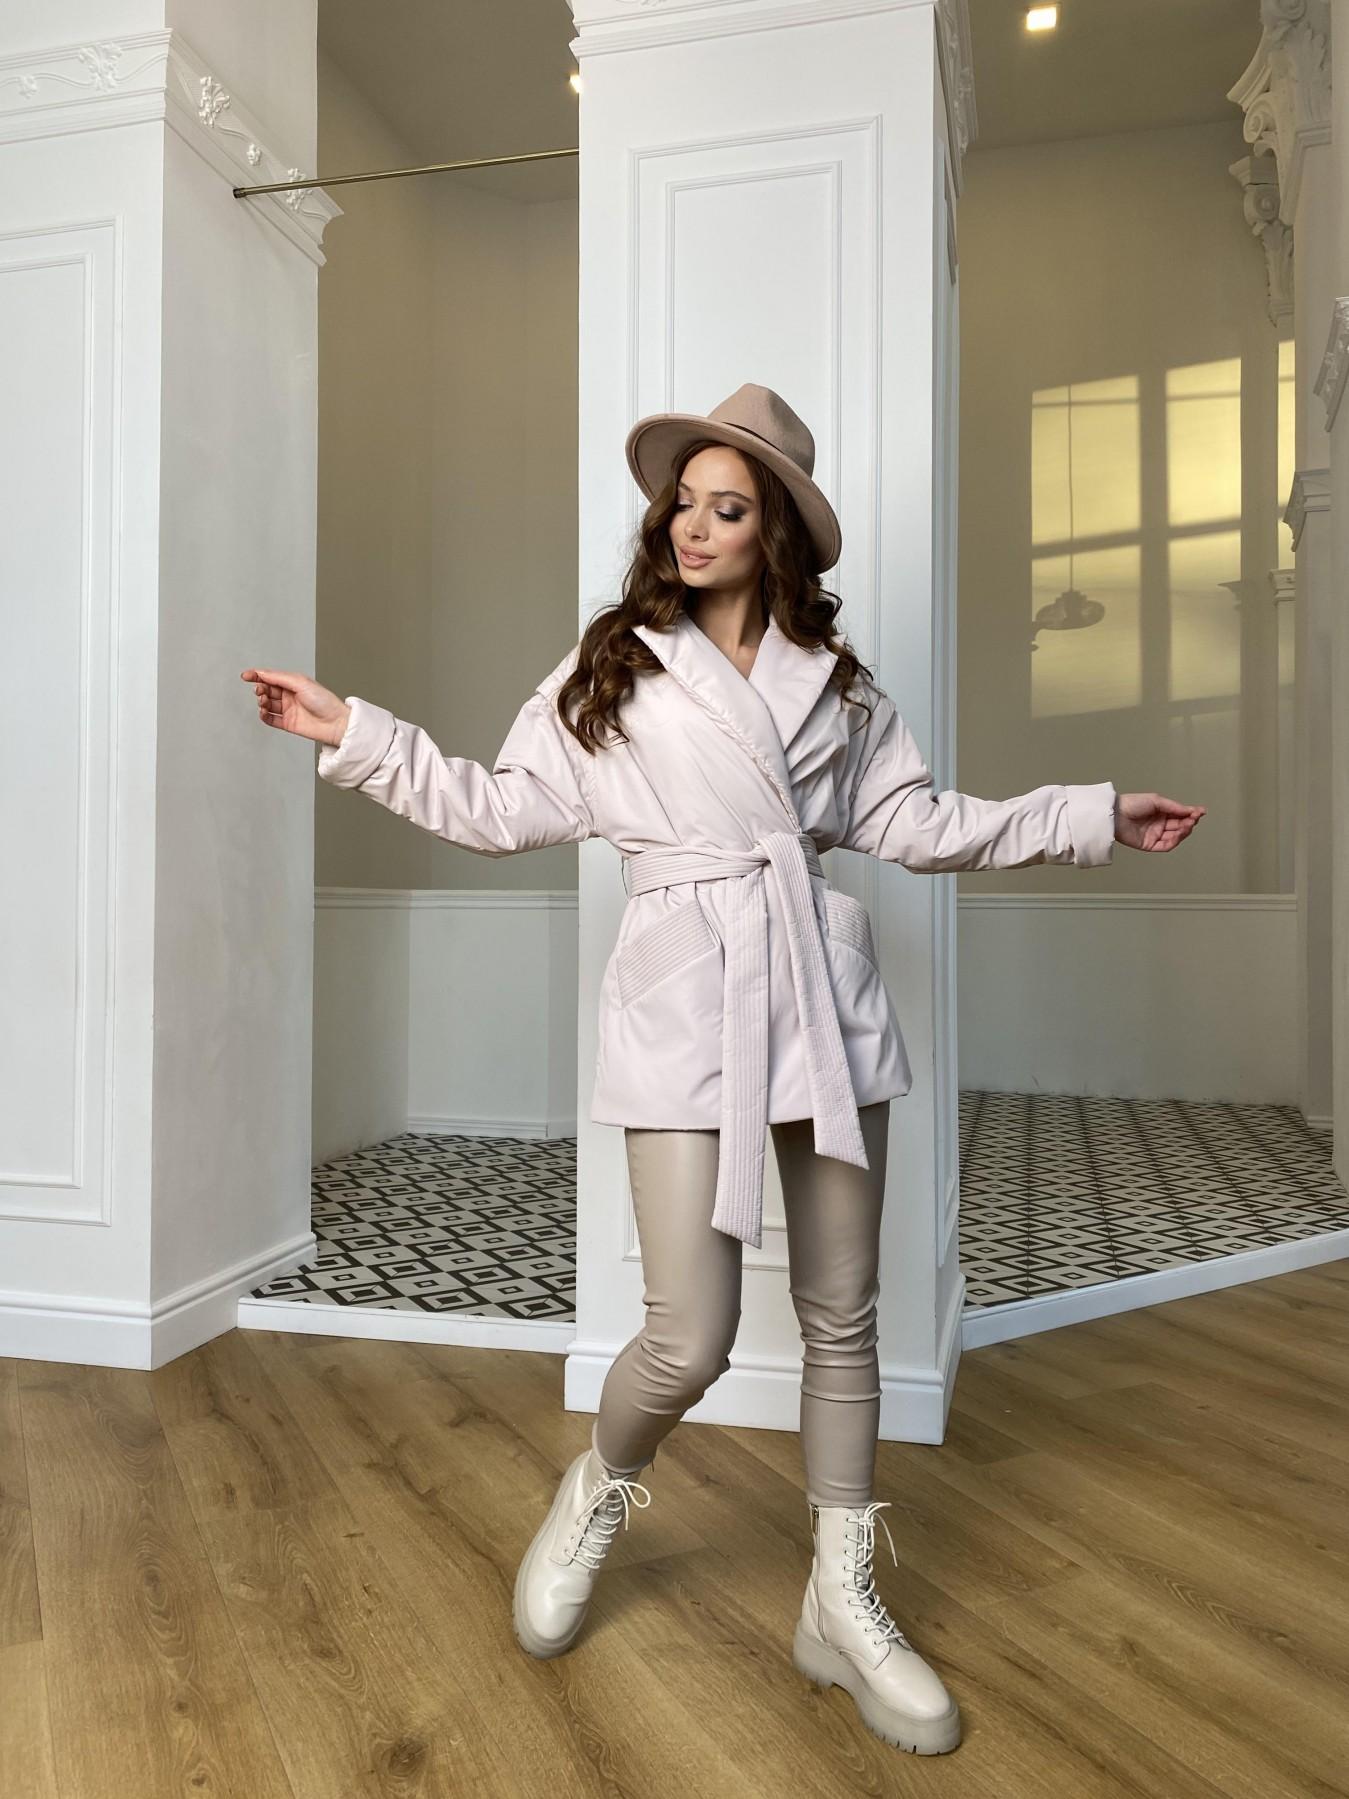 Форбс плащевка Ammy куртка 10817 АРТ. 47298 Цвет: Молоко - фото 7, интернет магазин tm-modus.ru